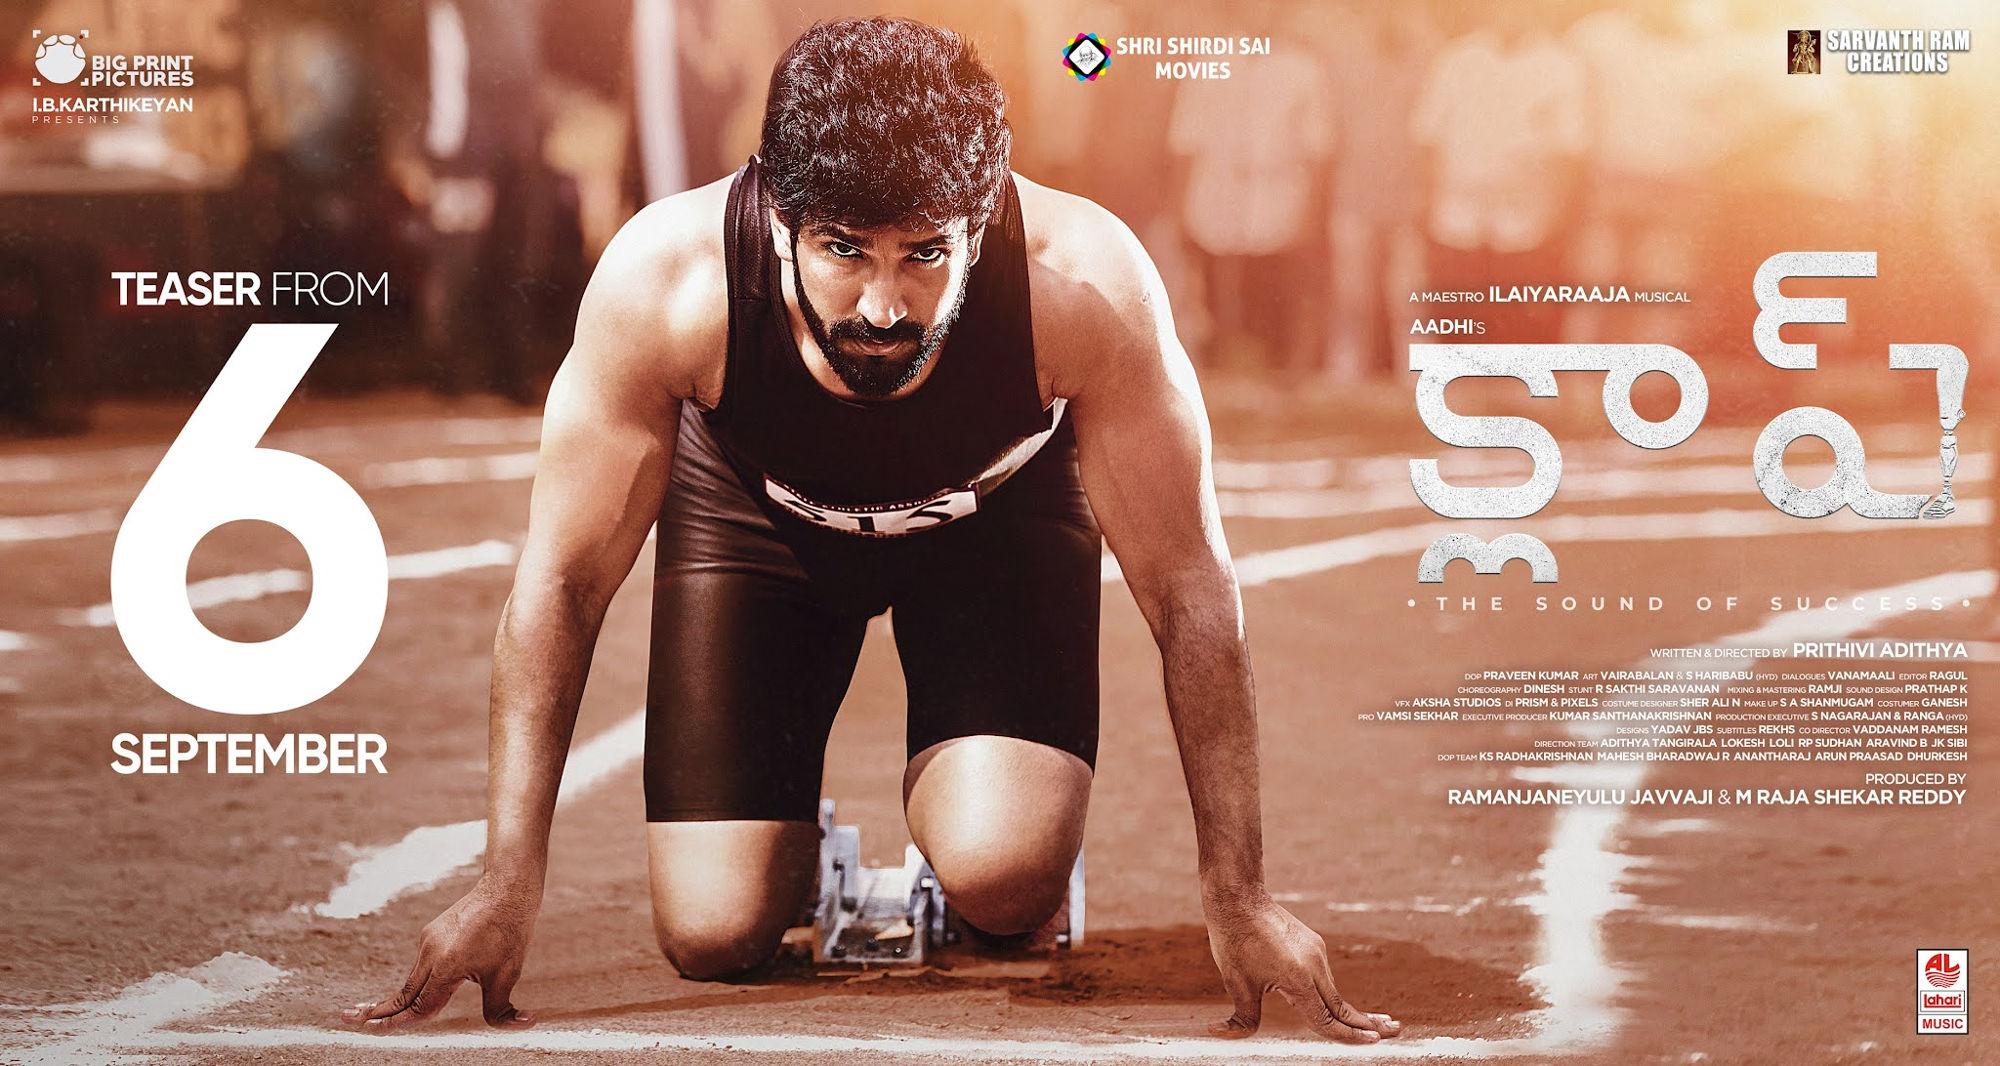 Hero Aadhi Pinisetty Clap Movie Teaser HD Wallpaper